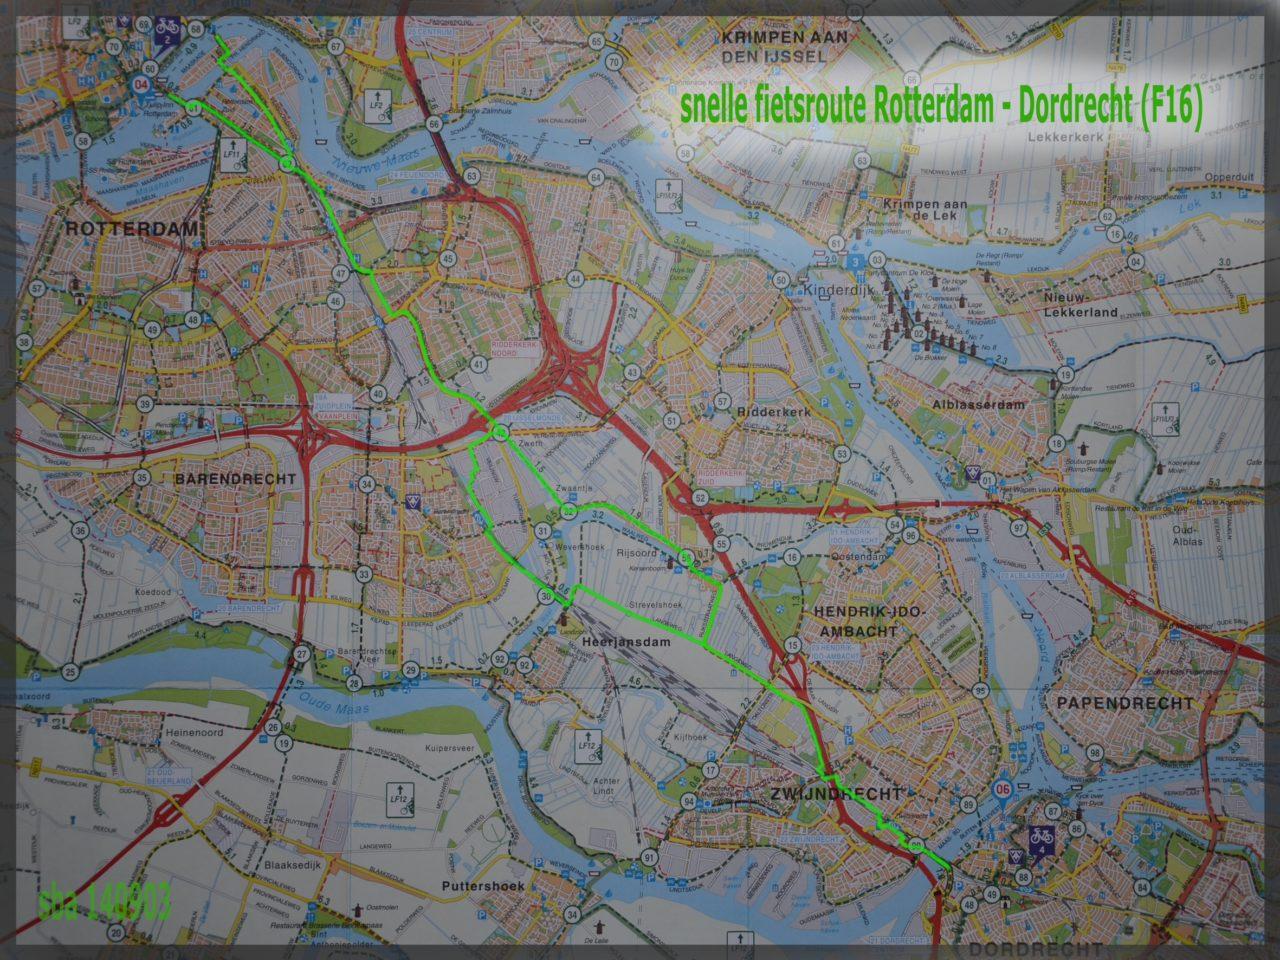 kaart_snelle_fietsroute_Rotterdam_-_Dordrecht_F161